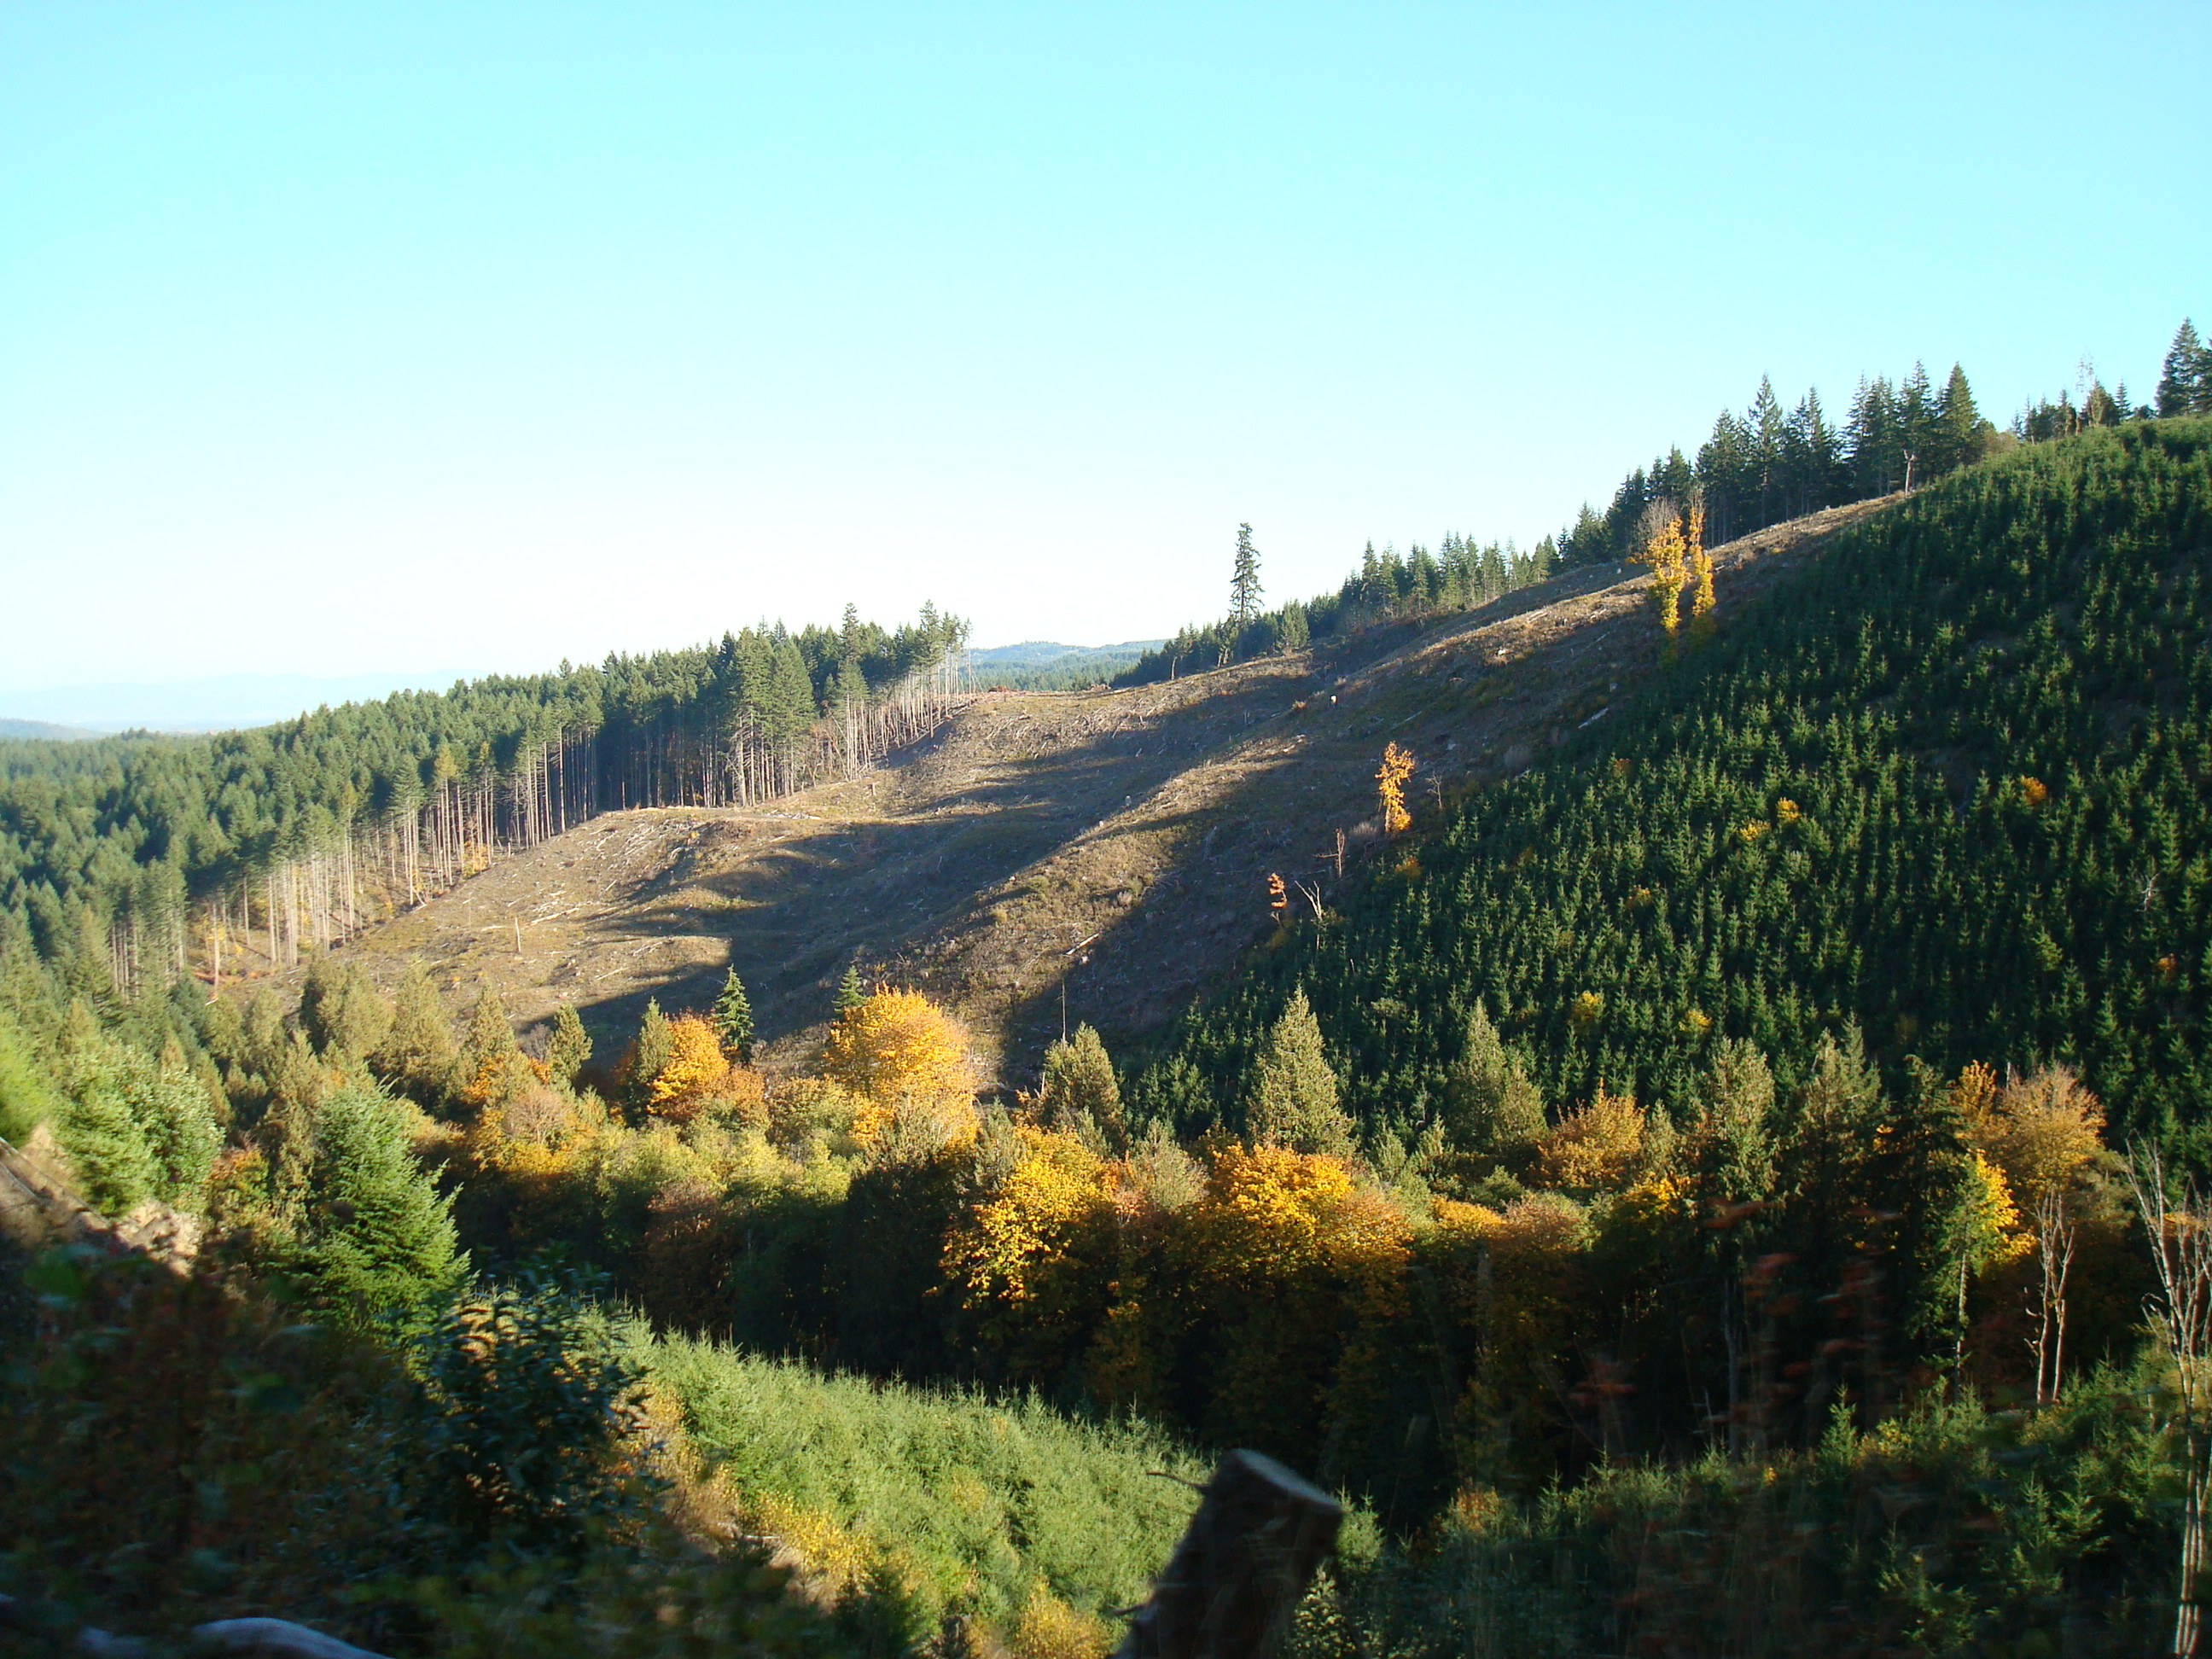 Denuded hillside south of Corvallis, Oregon